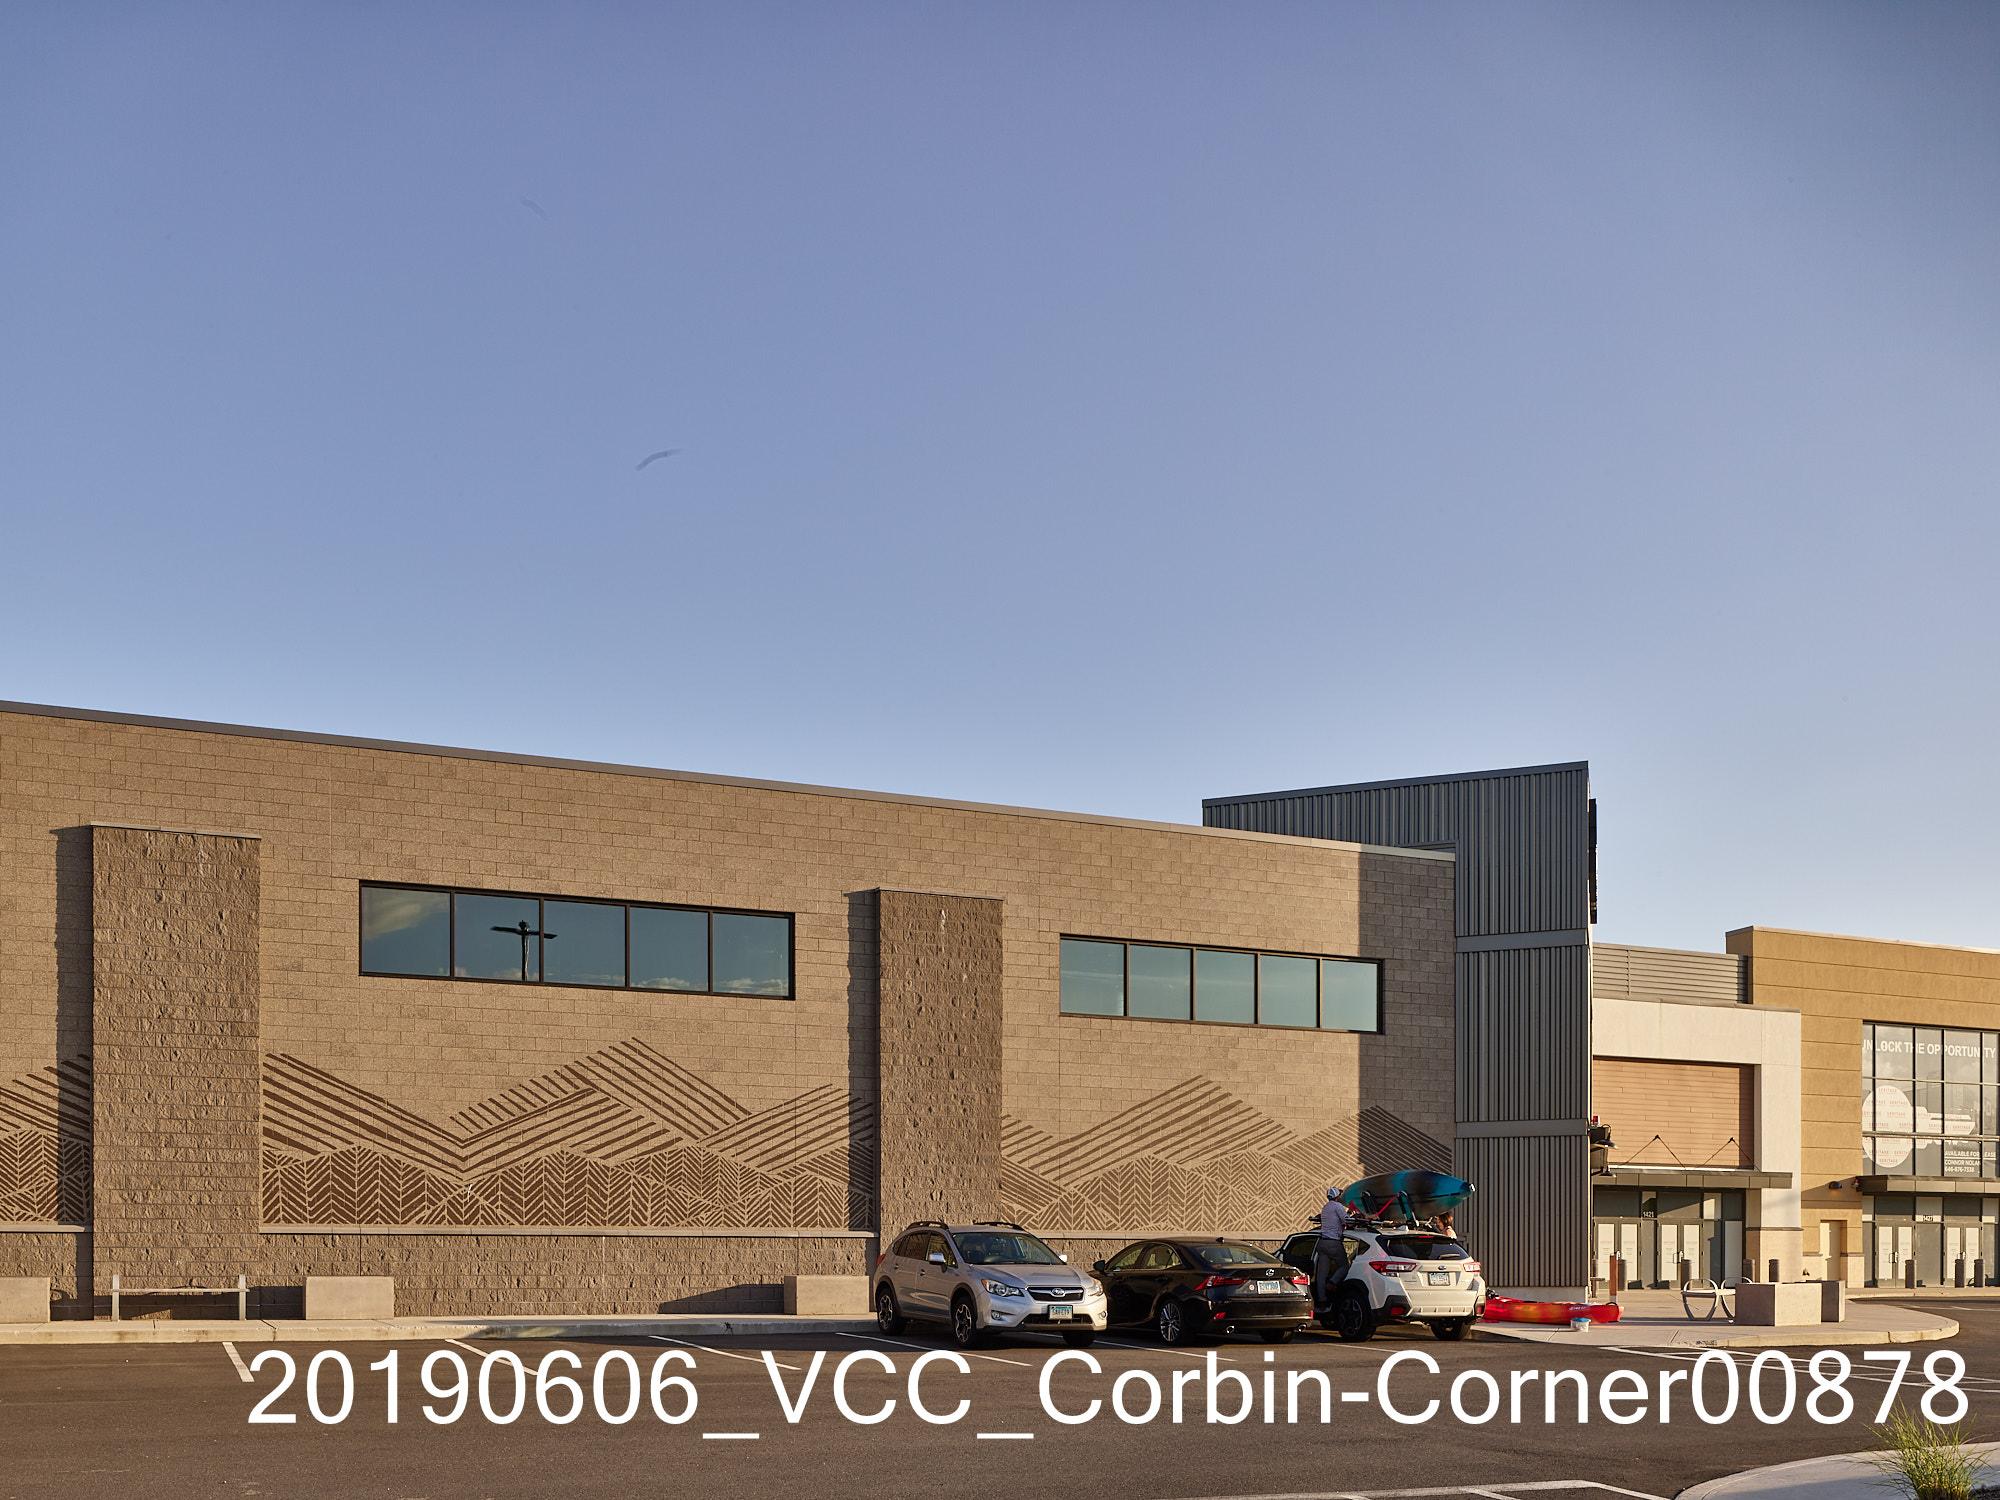 20190606_VCC_Corbin-Corner00878.jpg